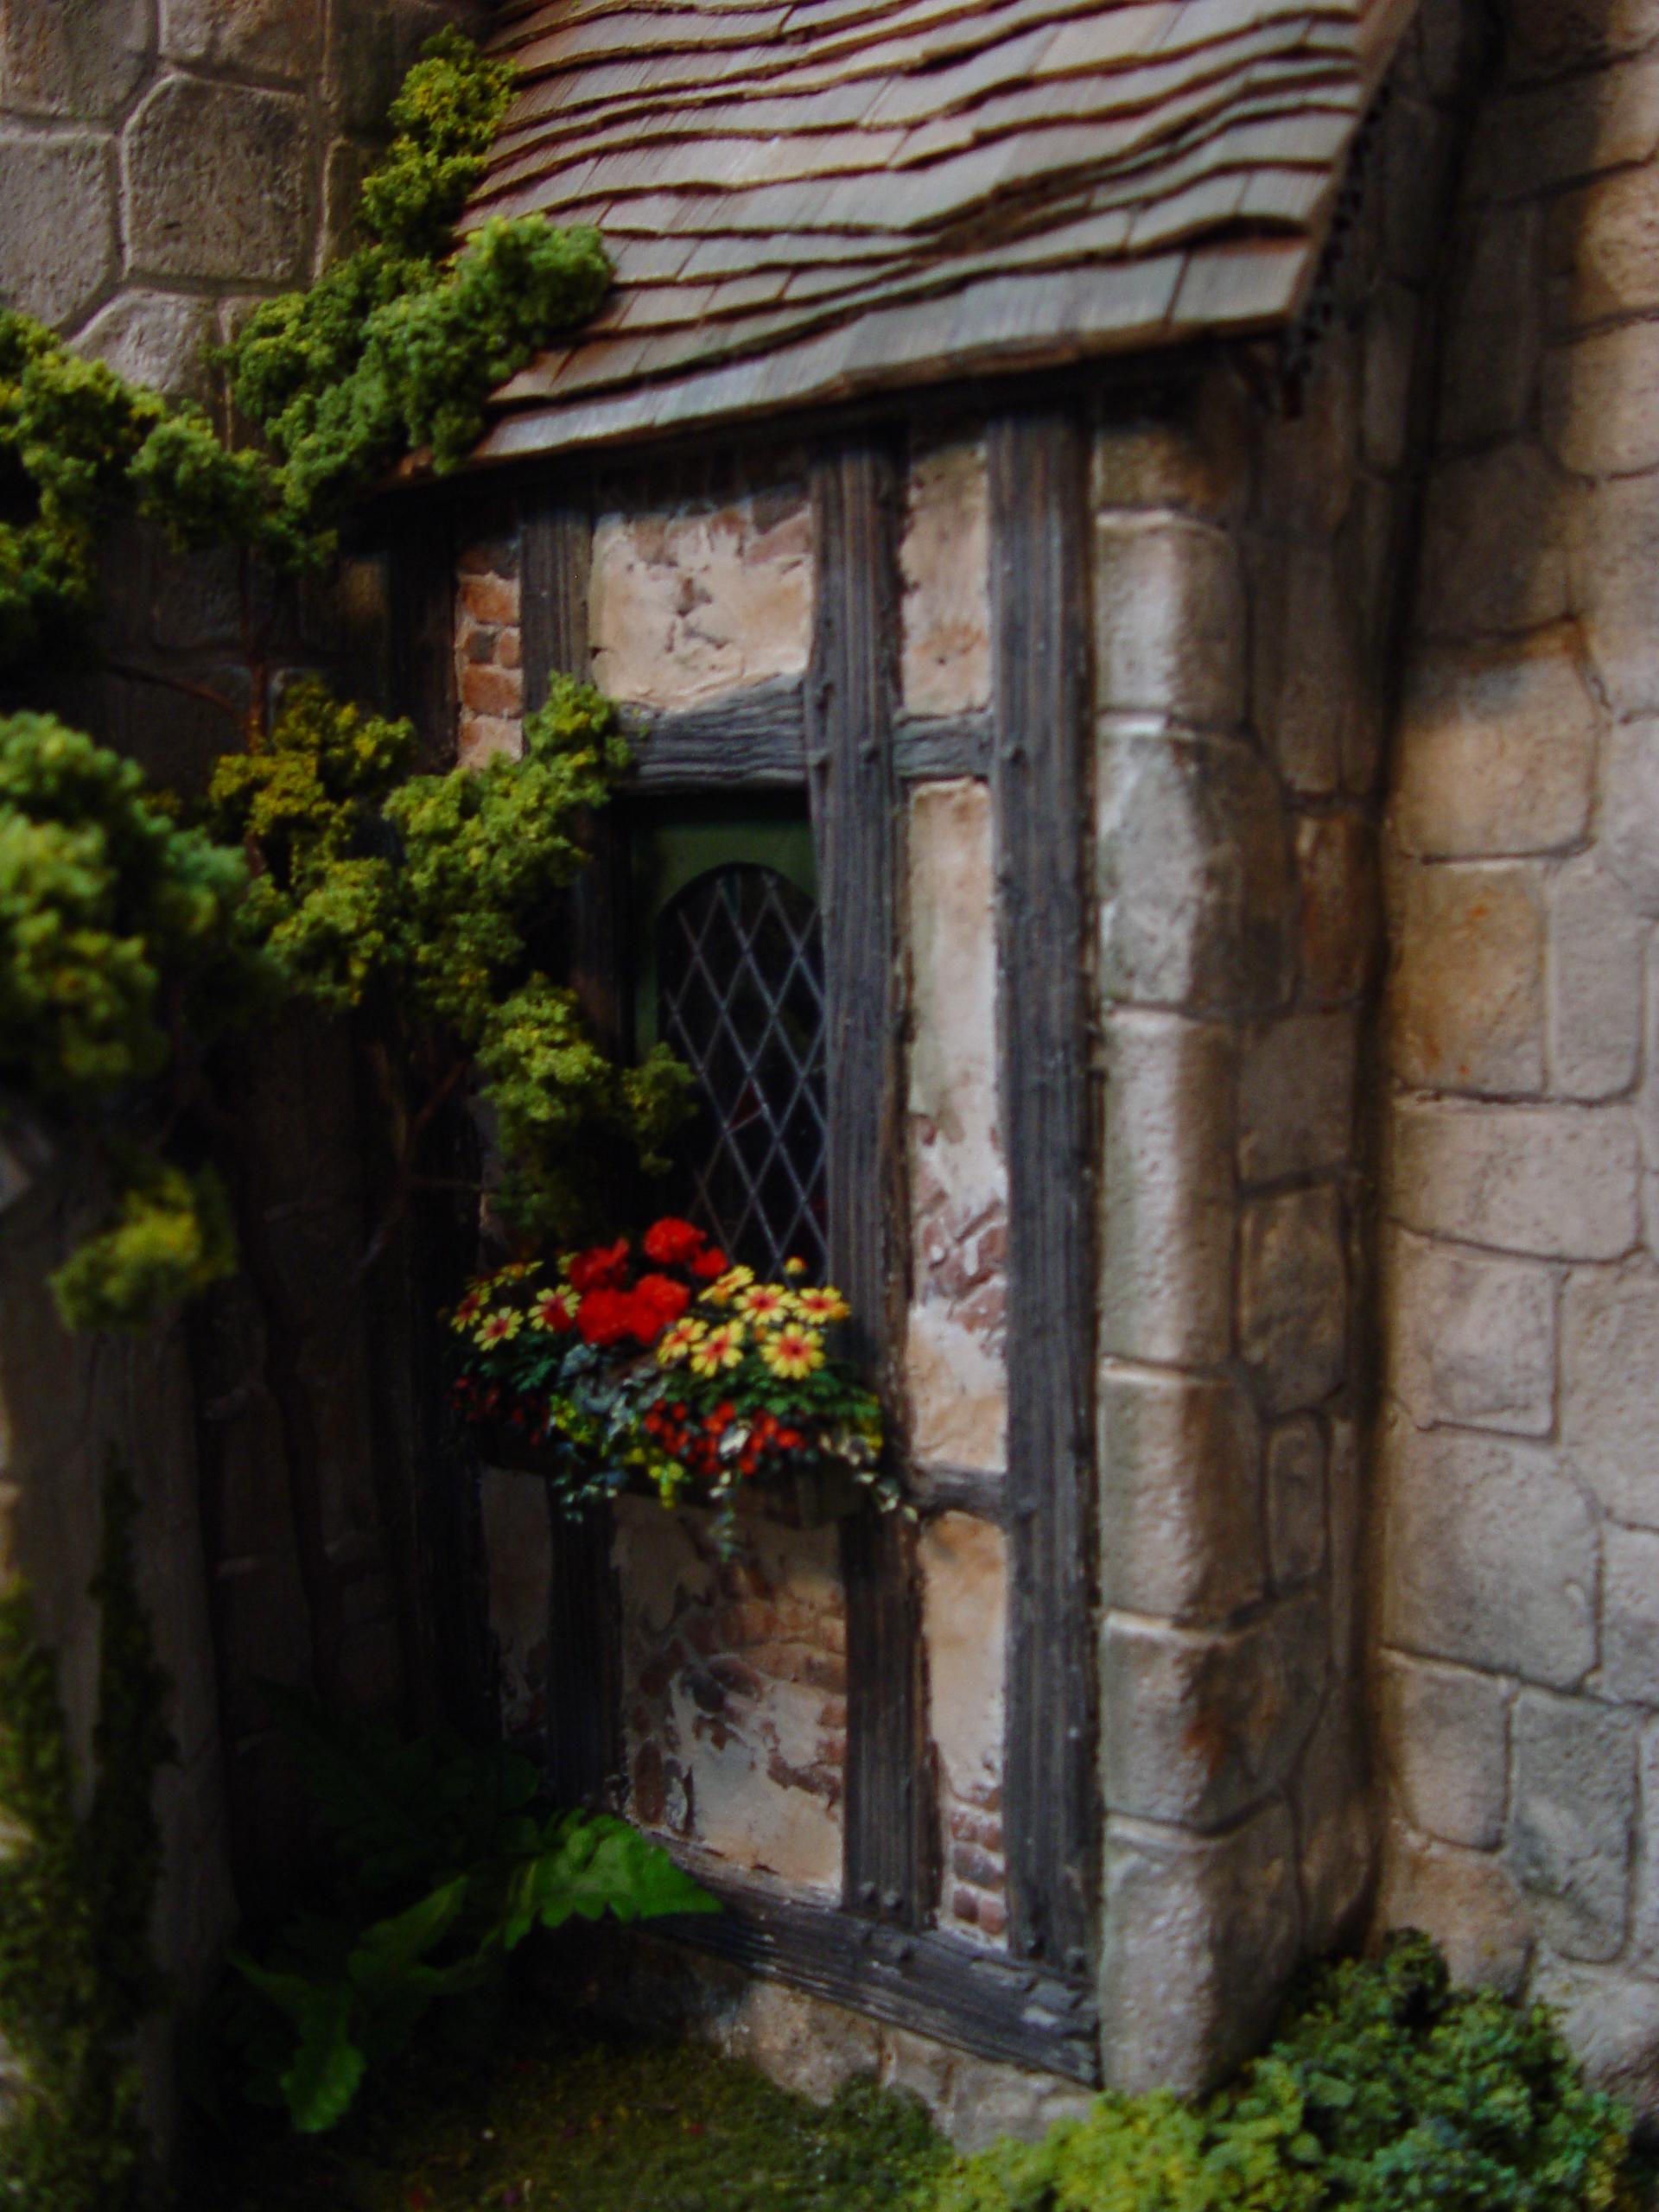 Diamond Pane Window w/Flowers